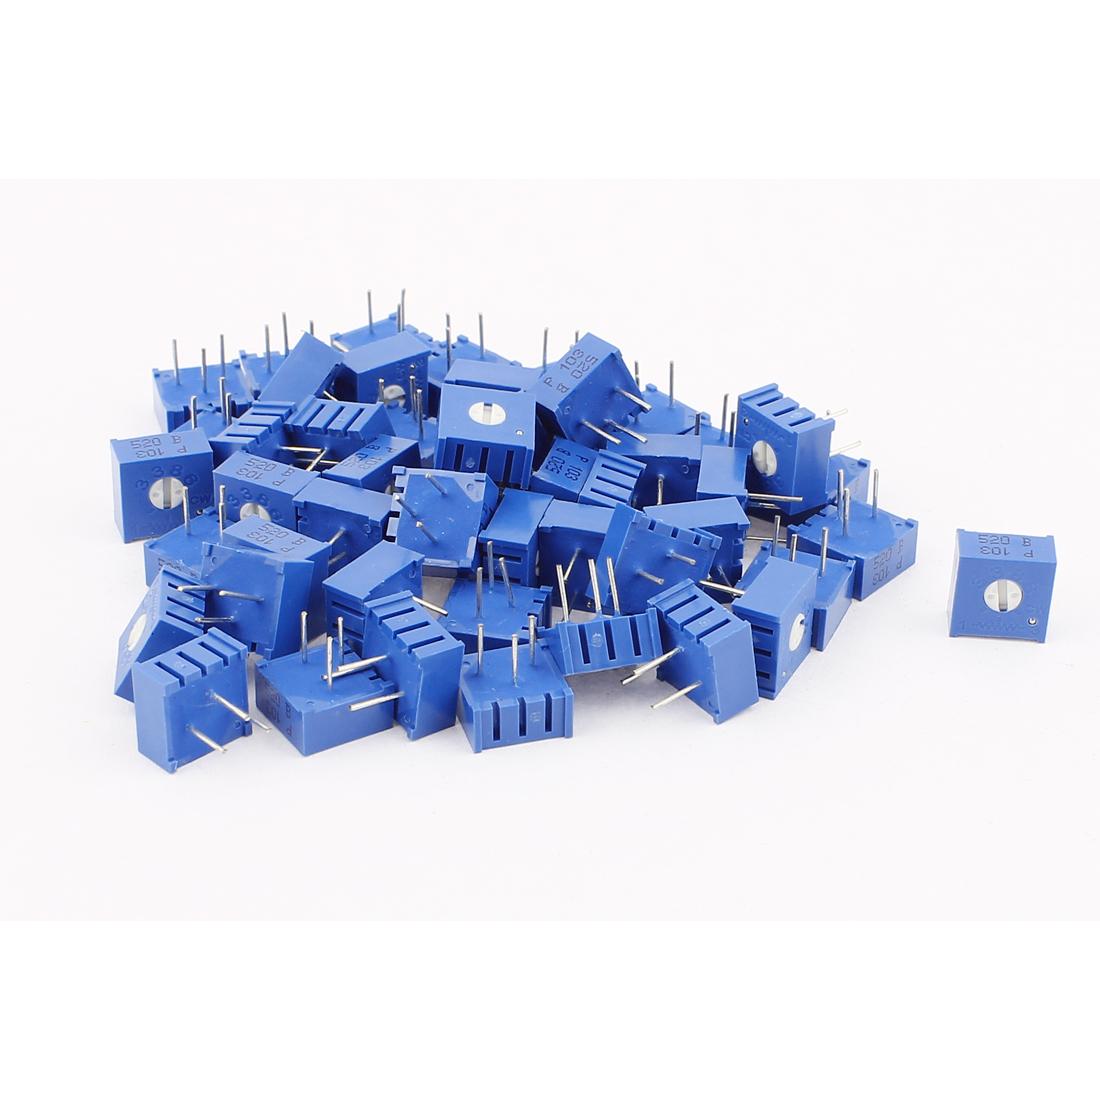 50Pcs Top Adjustment Trimmer Pot Potentiometer Resistors 10K Ohm 3386P